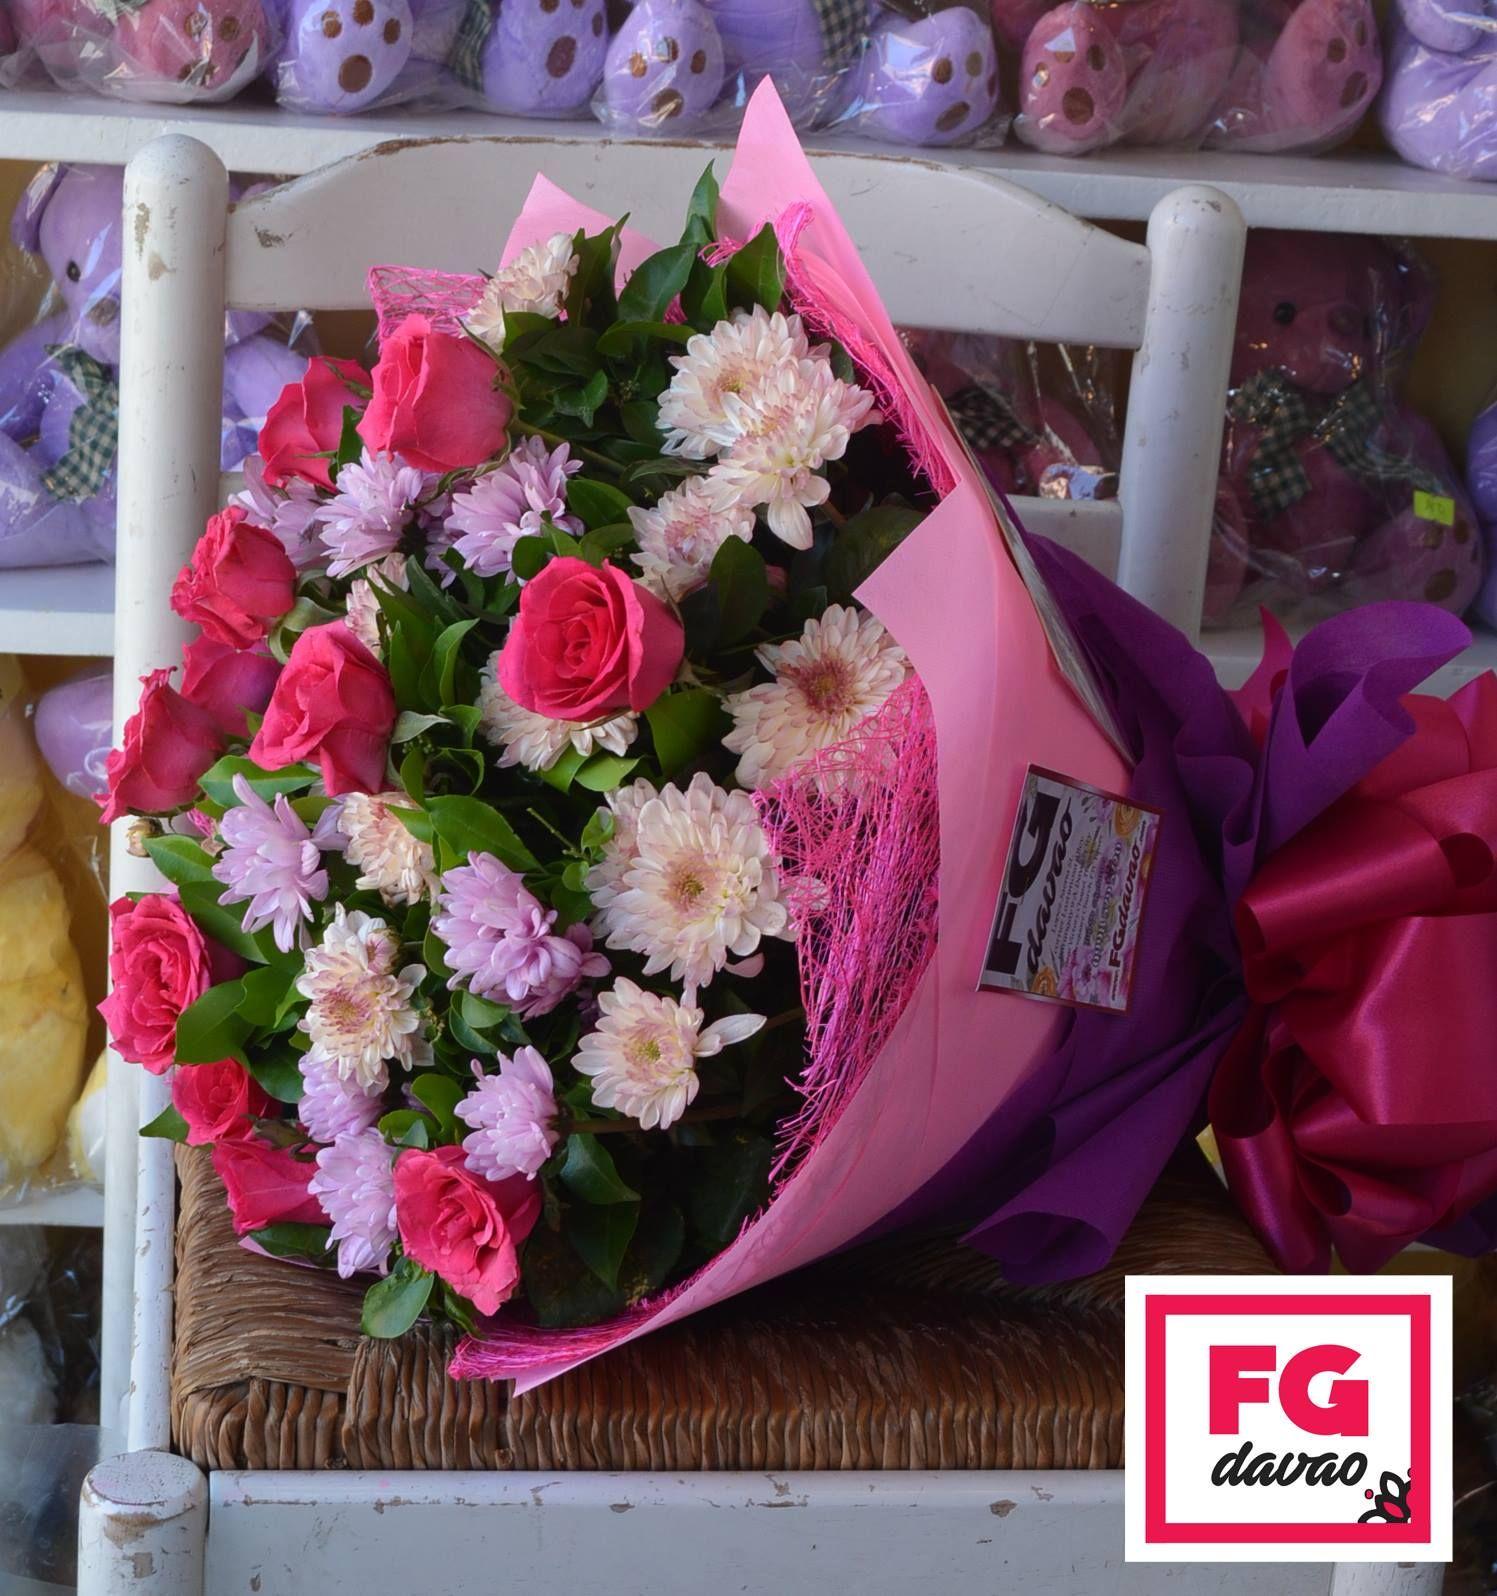 Send Flowers To Davao Philippines 123 Lopez Jaena St Davao City